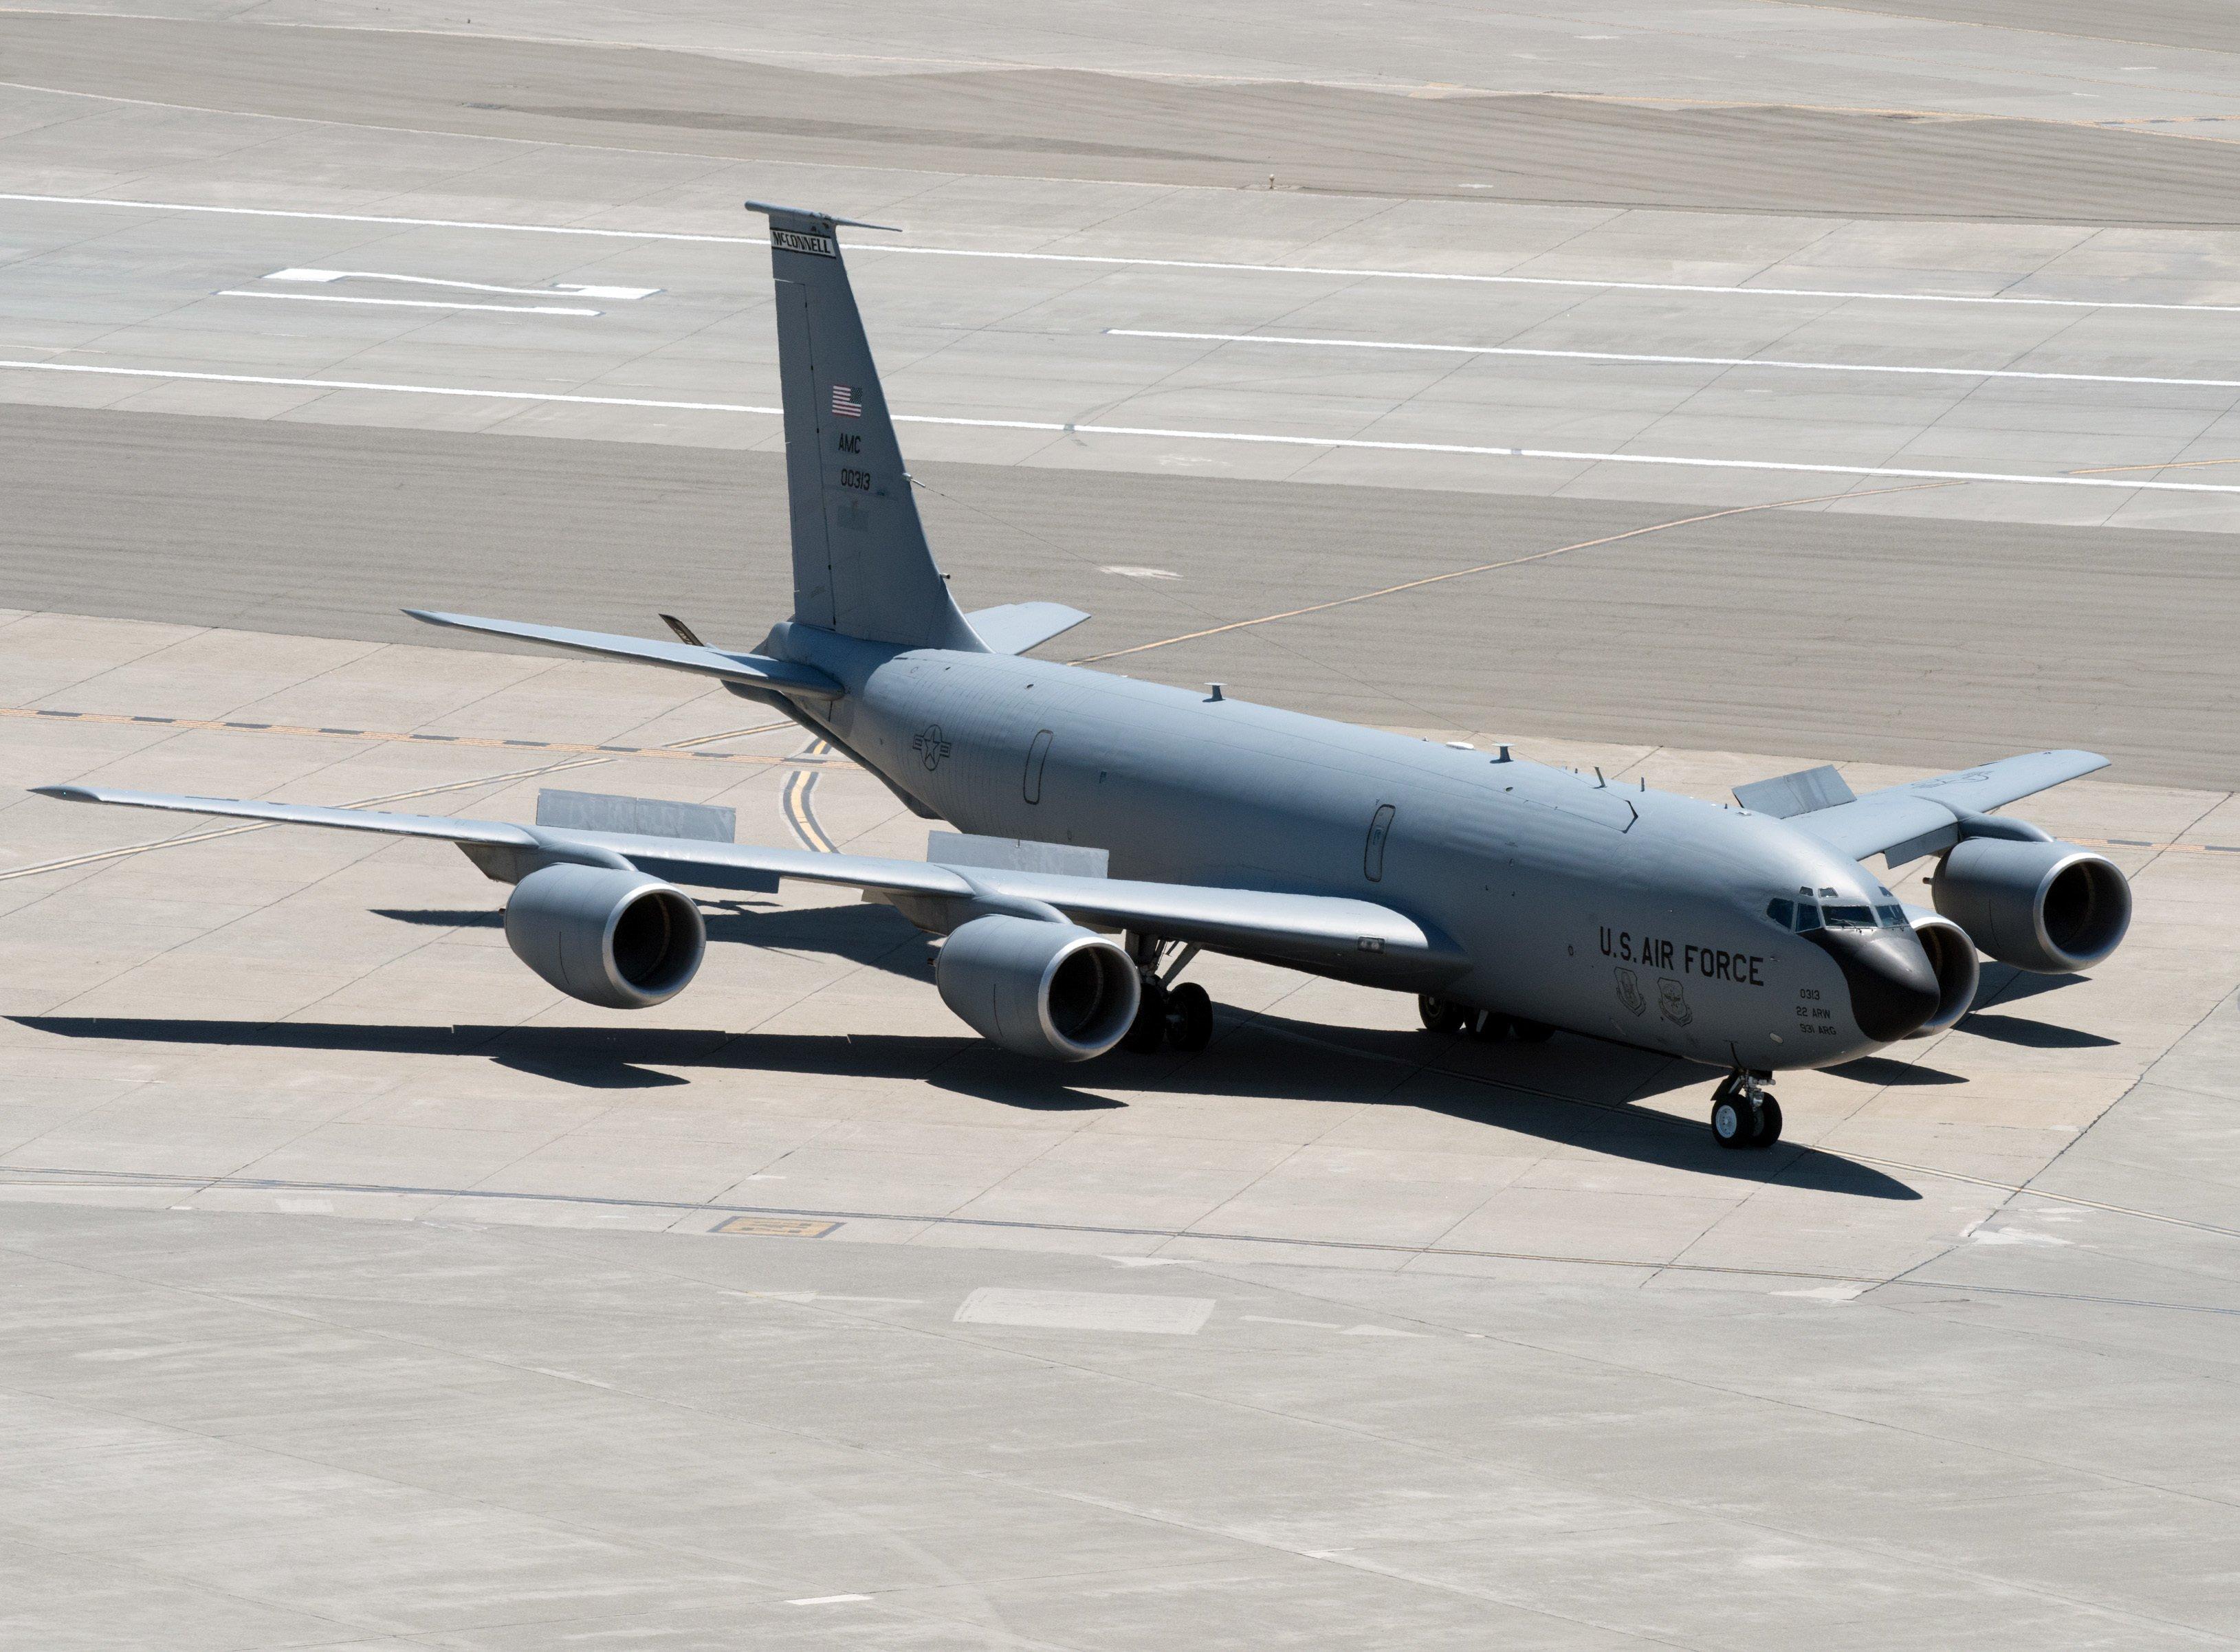 KC-135 at Travis AFB on 18-05-17 [USAF/Louis Briscese]